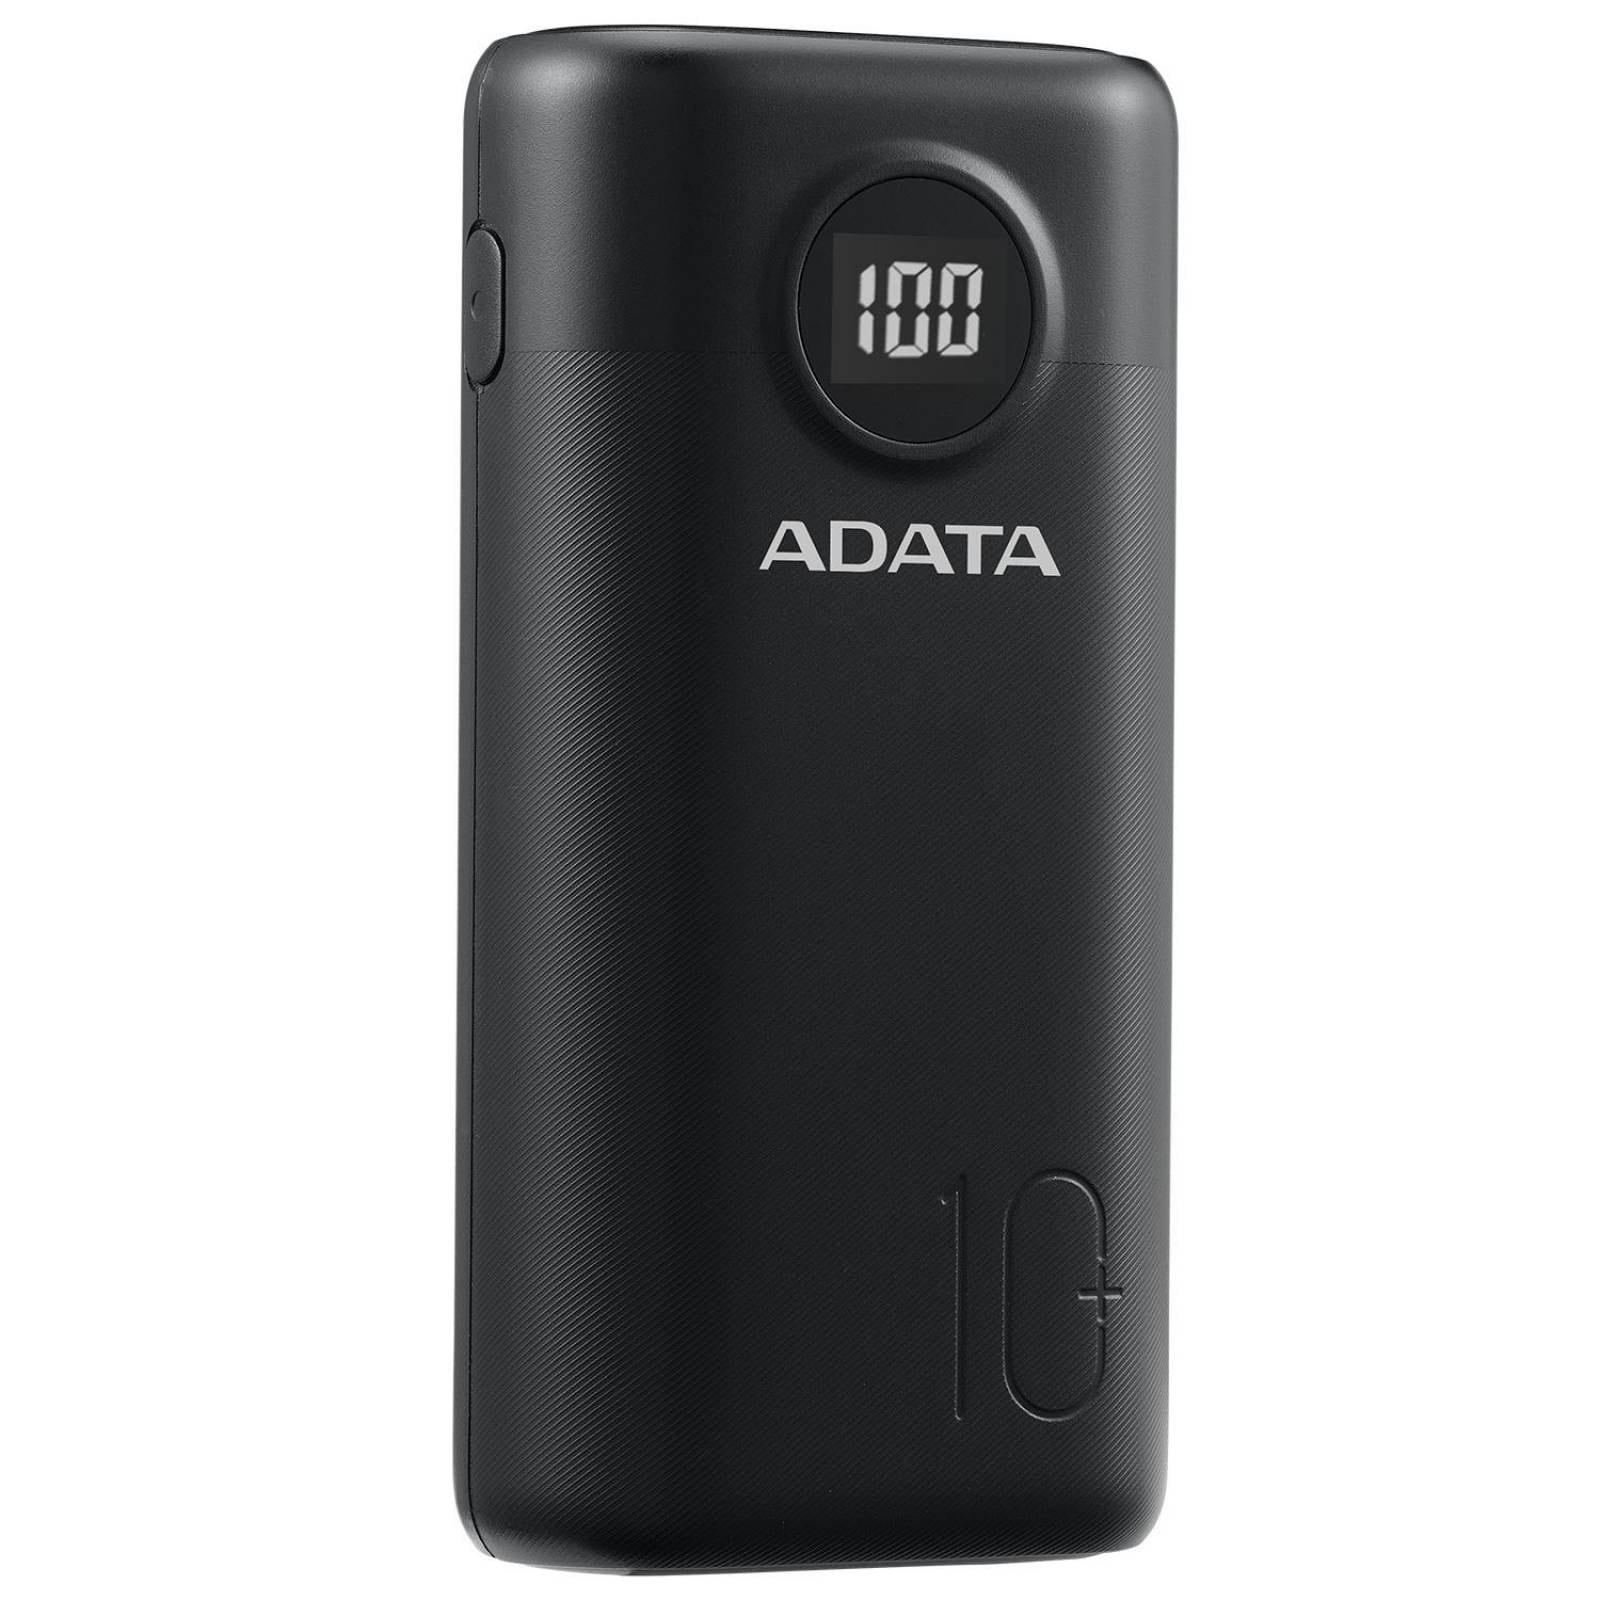 Power Bank 20000MAH ADATA P20000QCD Bateria Portatil Tipo C AP20000QCD-DGT-CBK